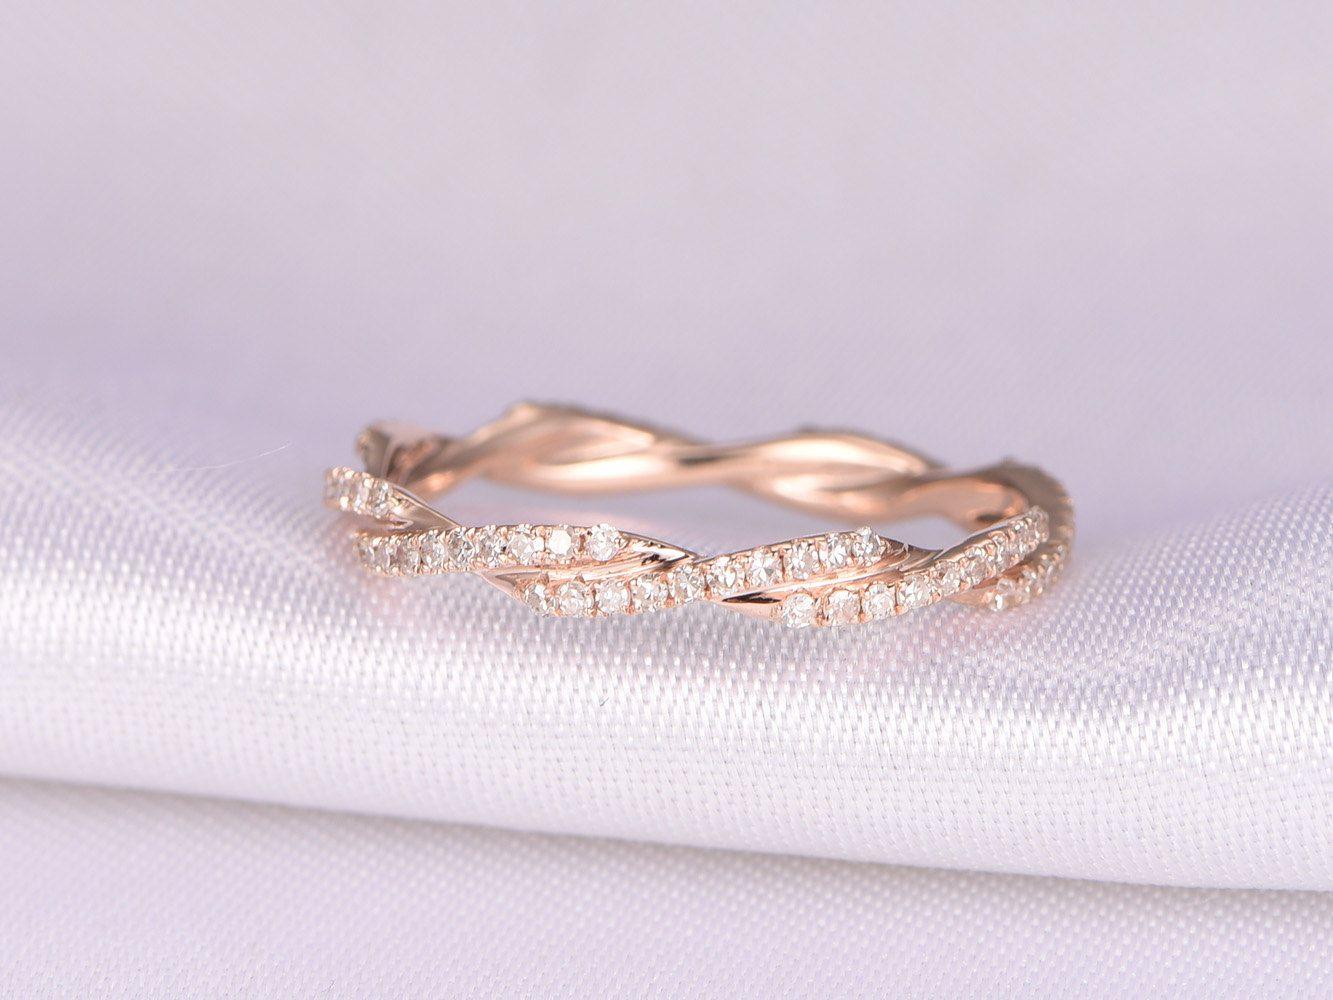 infinity diamond wedding band Criss Cross Ring Full Eternity diamond Wedding ring Twist wedding band Anniversary ring